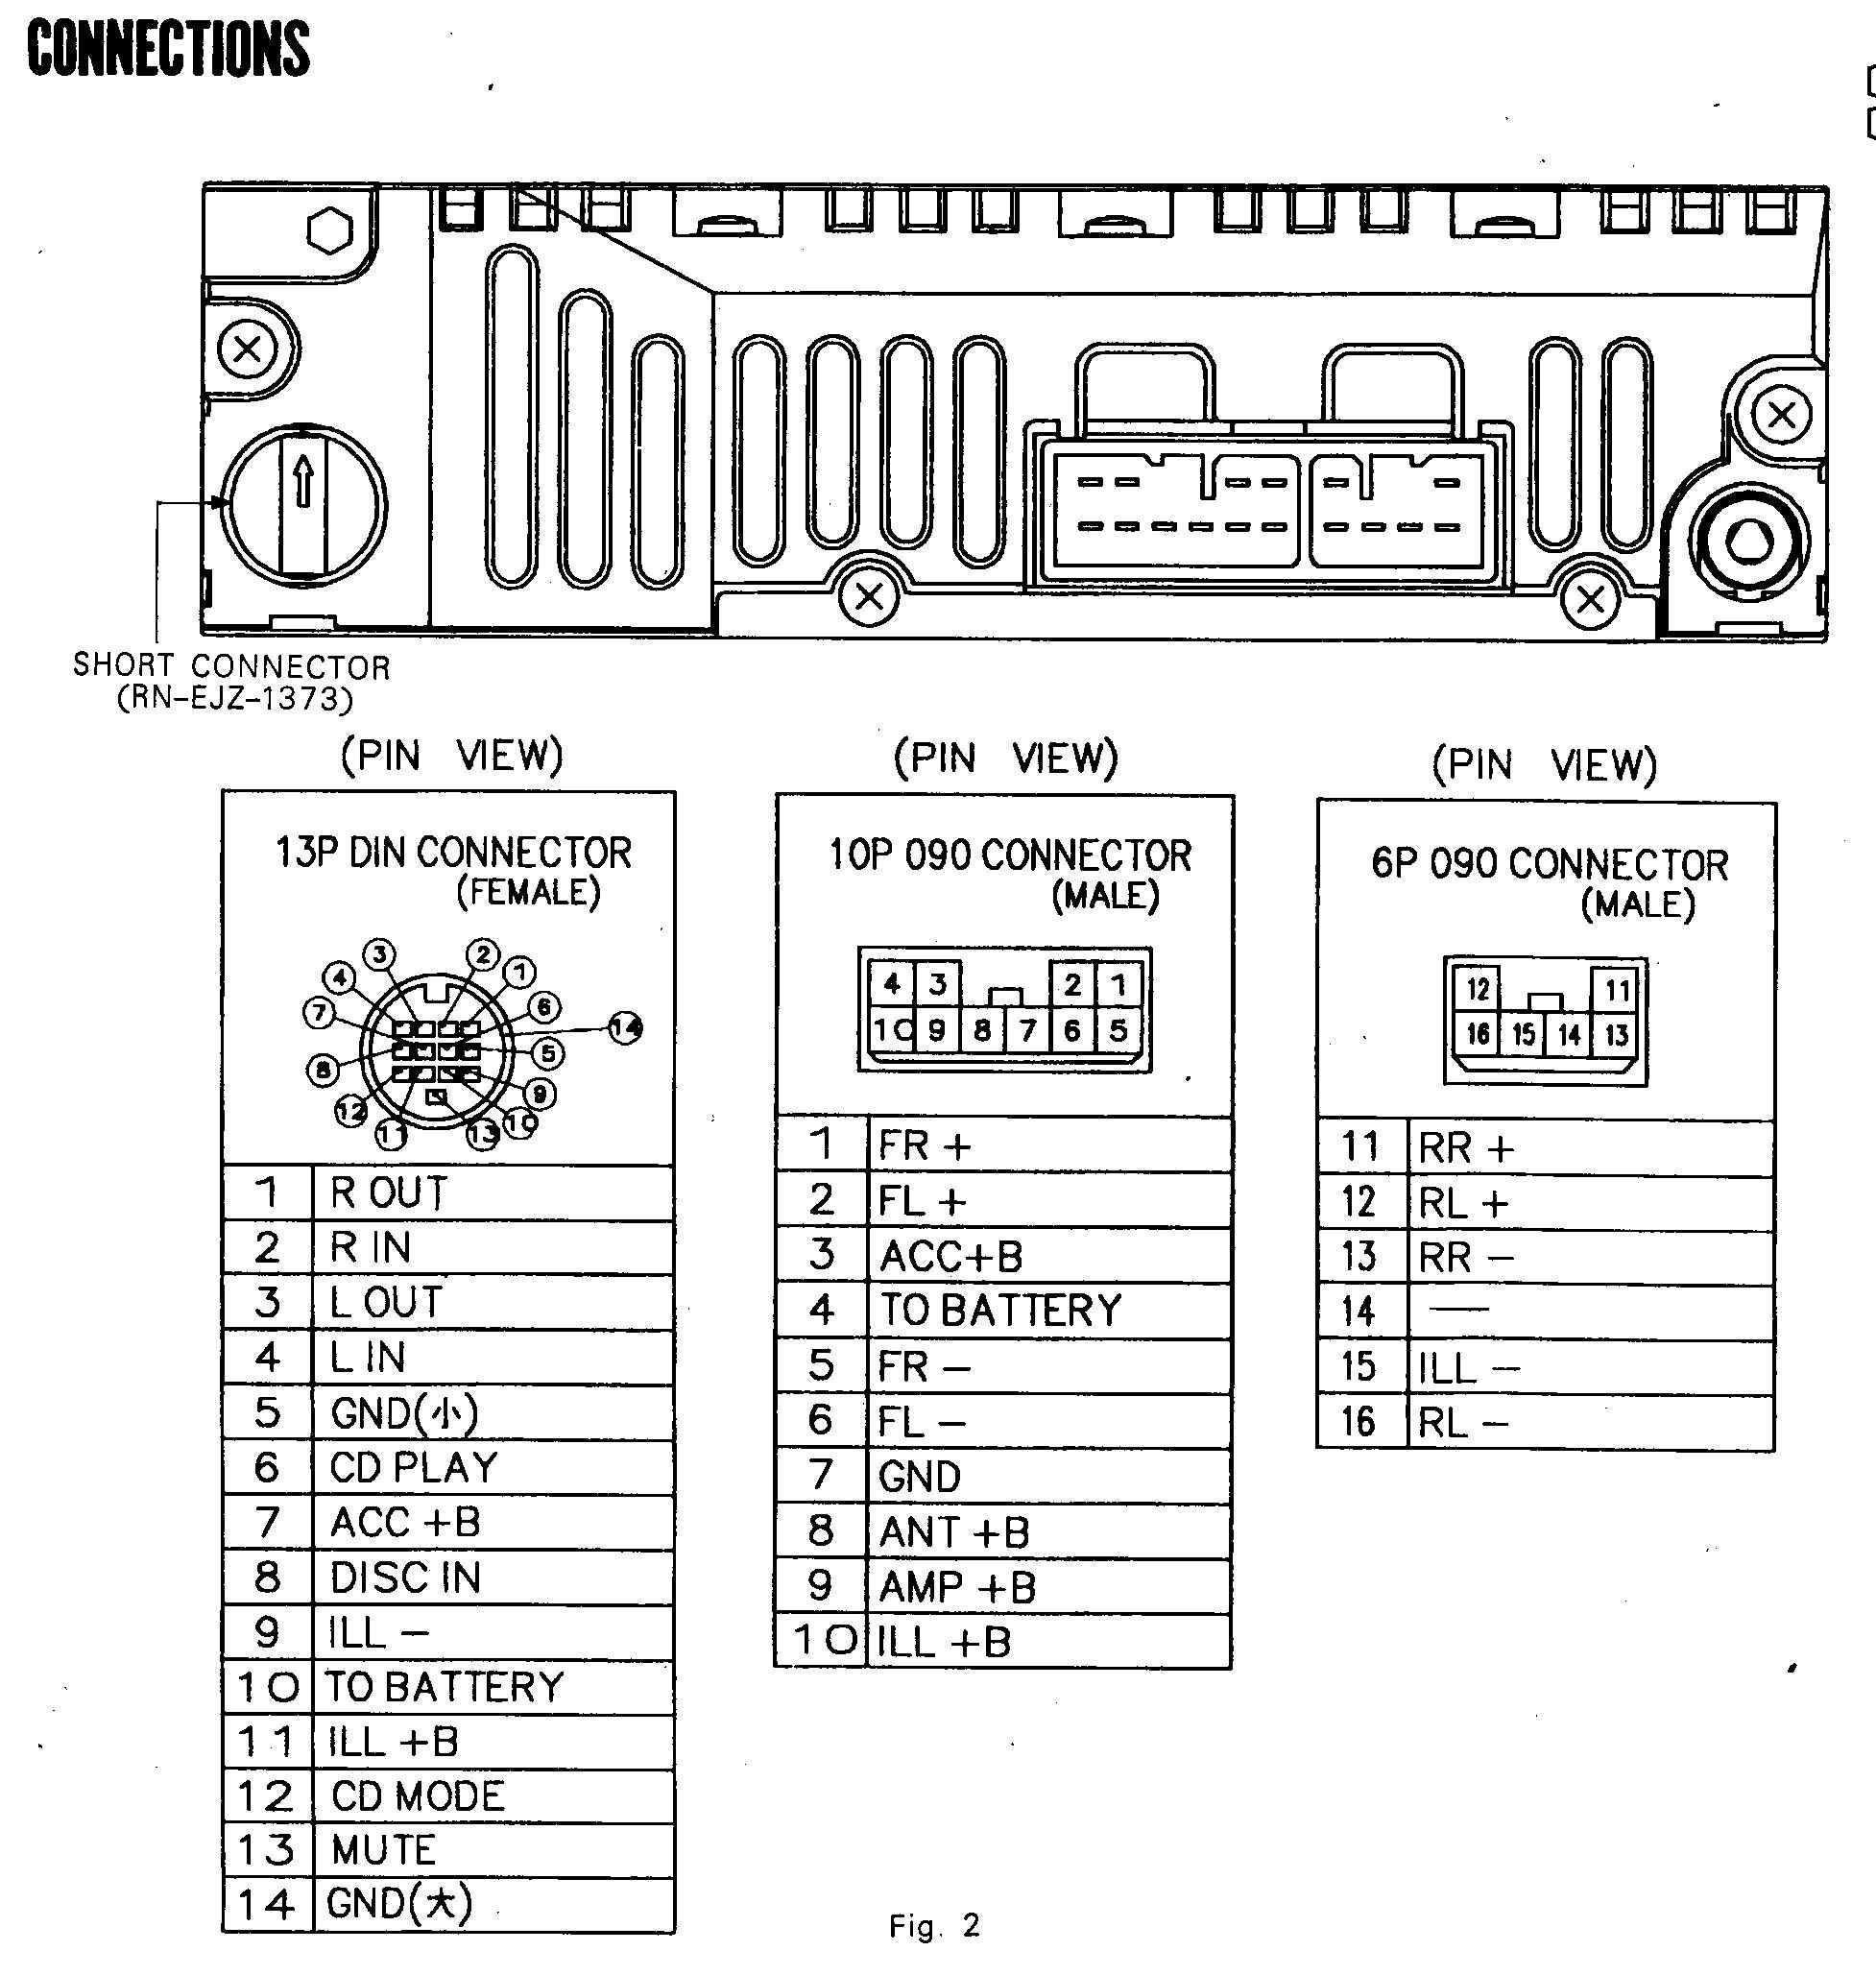 Car Deck Wiring Diagram | Wiring Library - Bose Car Amplifier Wiring Diagram